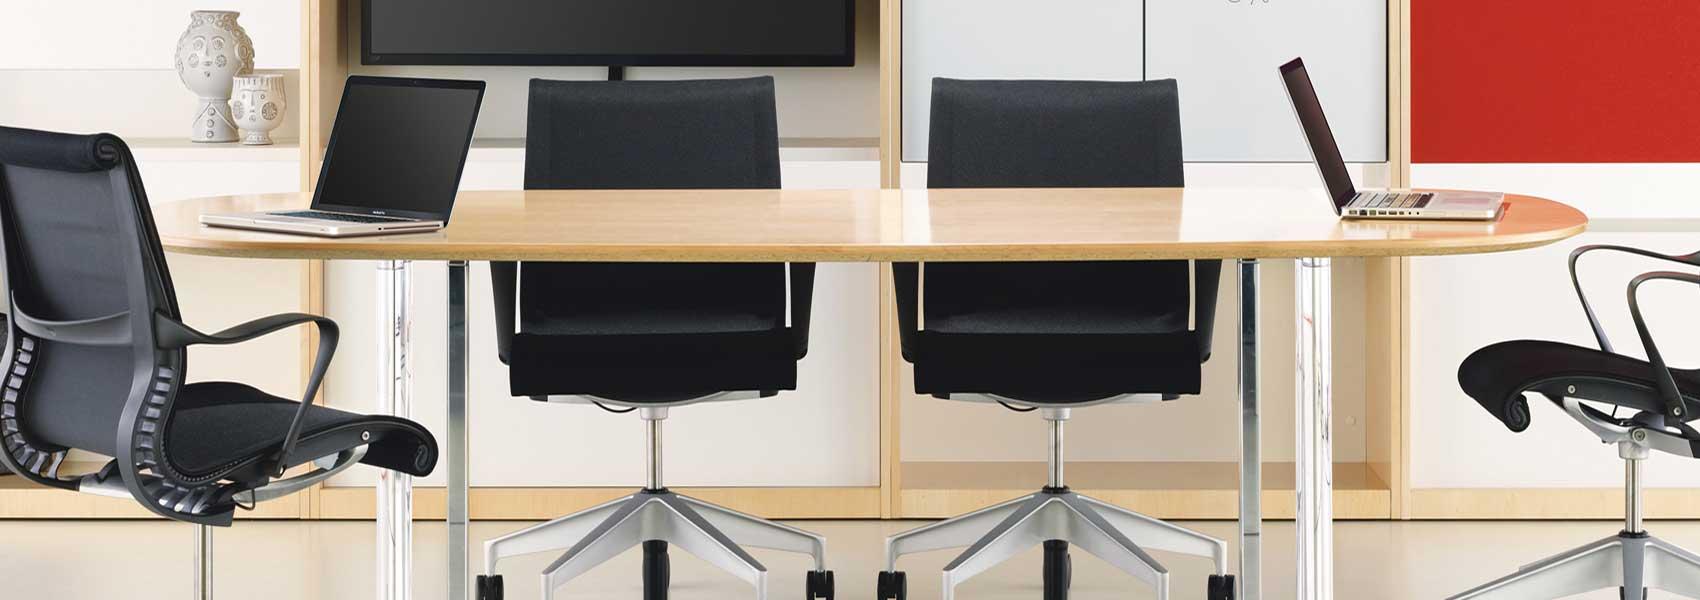 Office Furniture Installation Amp Design